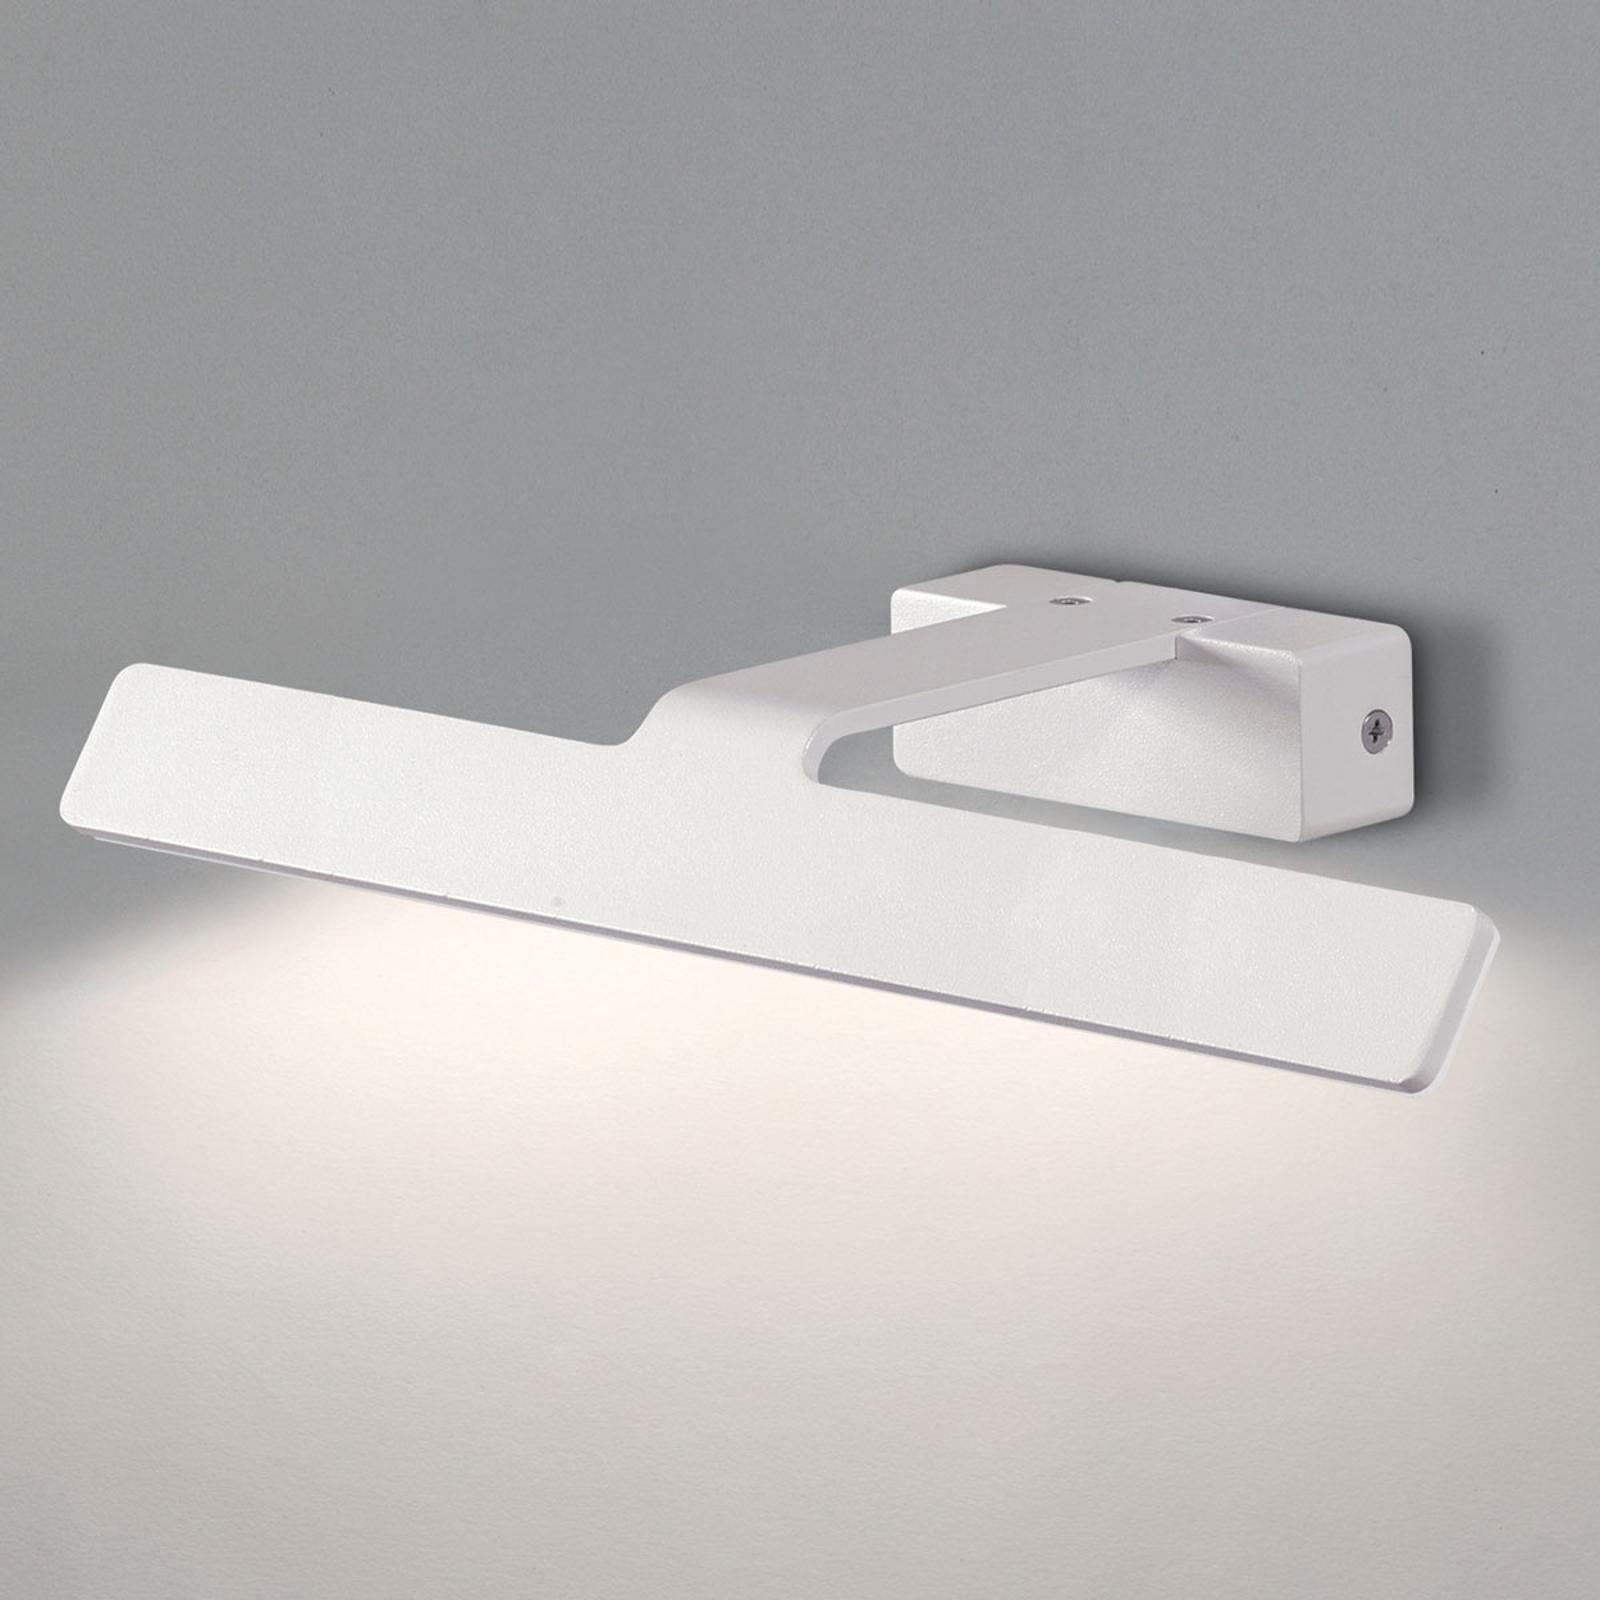 Vit LED-tavelbelysning Neus - 36 cm bred